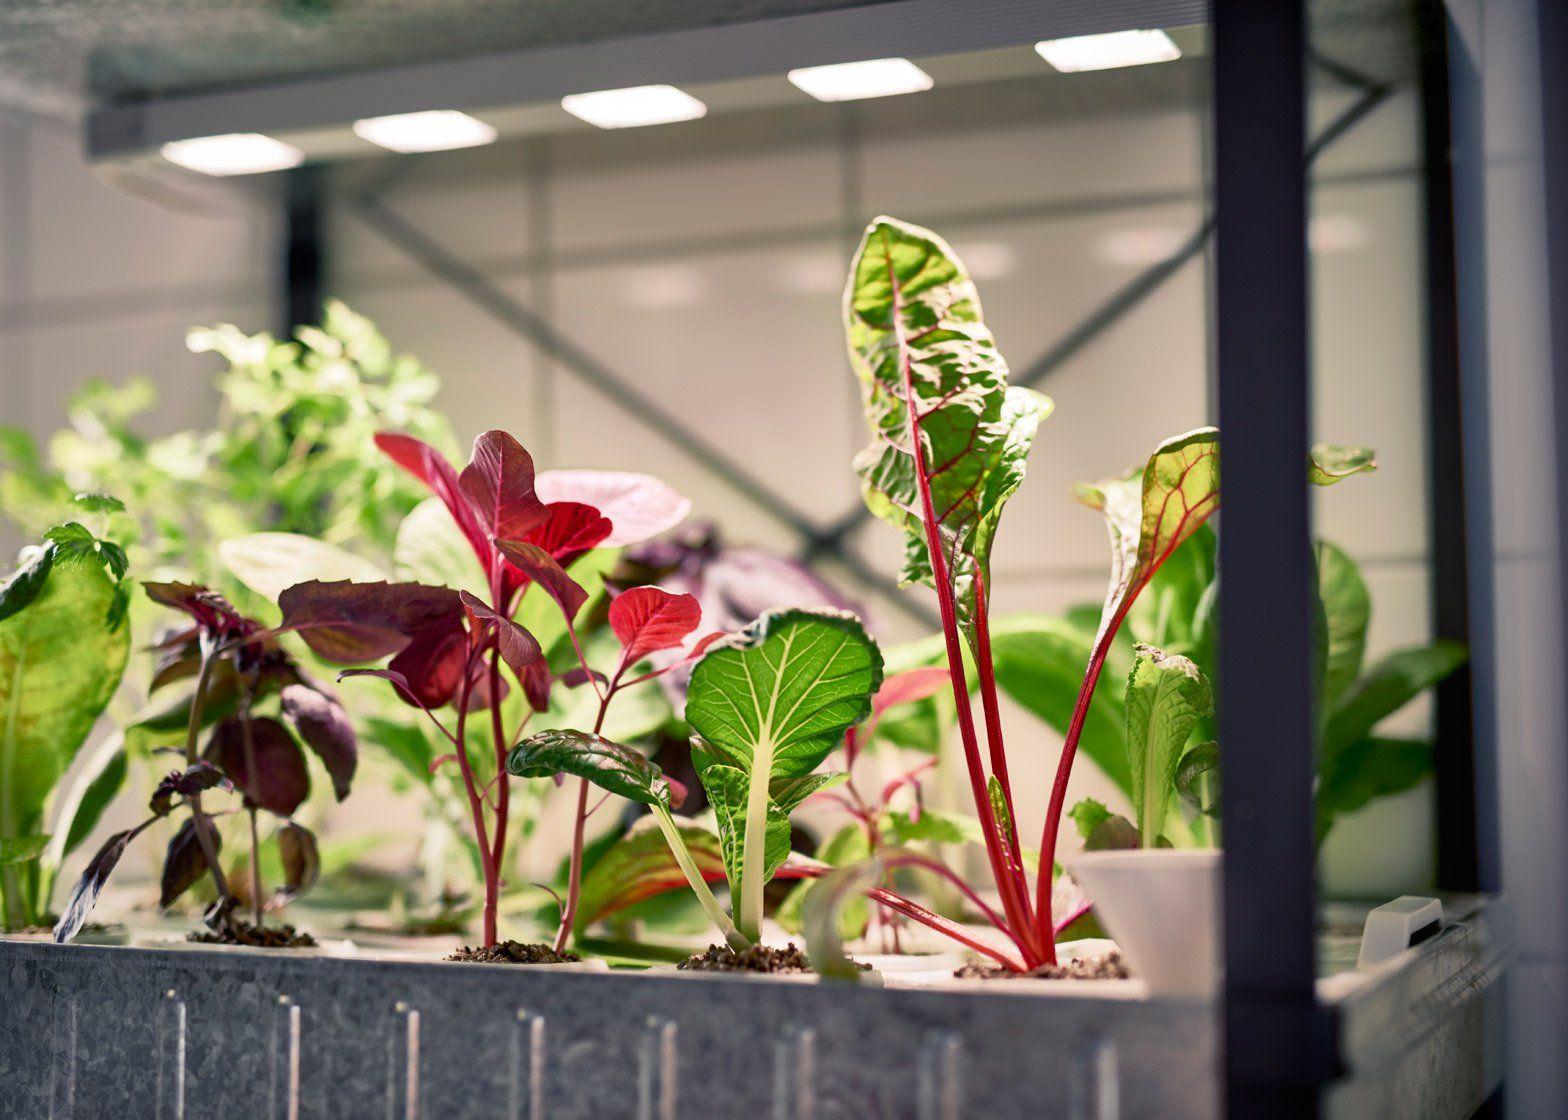 Ikea introduce a hydroponic indoor gardening kit Bahçecilik